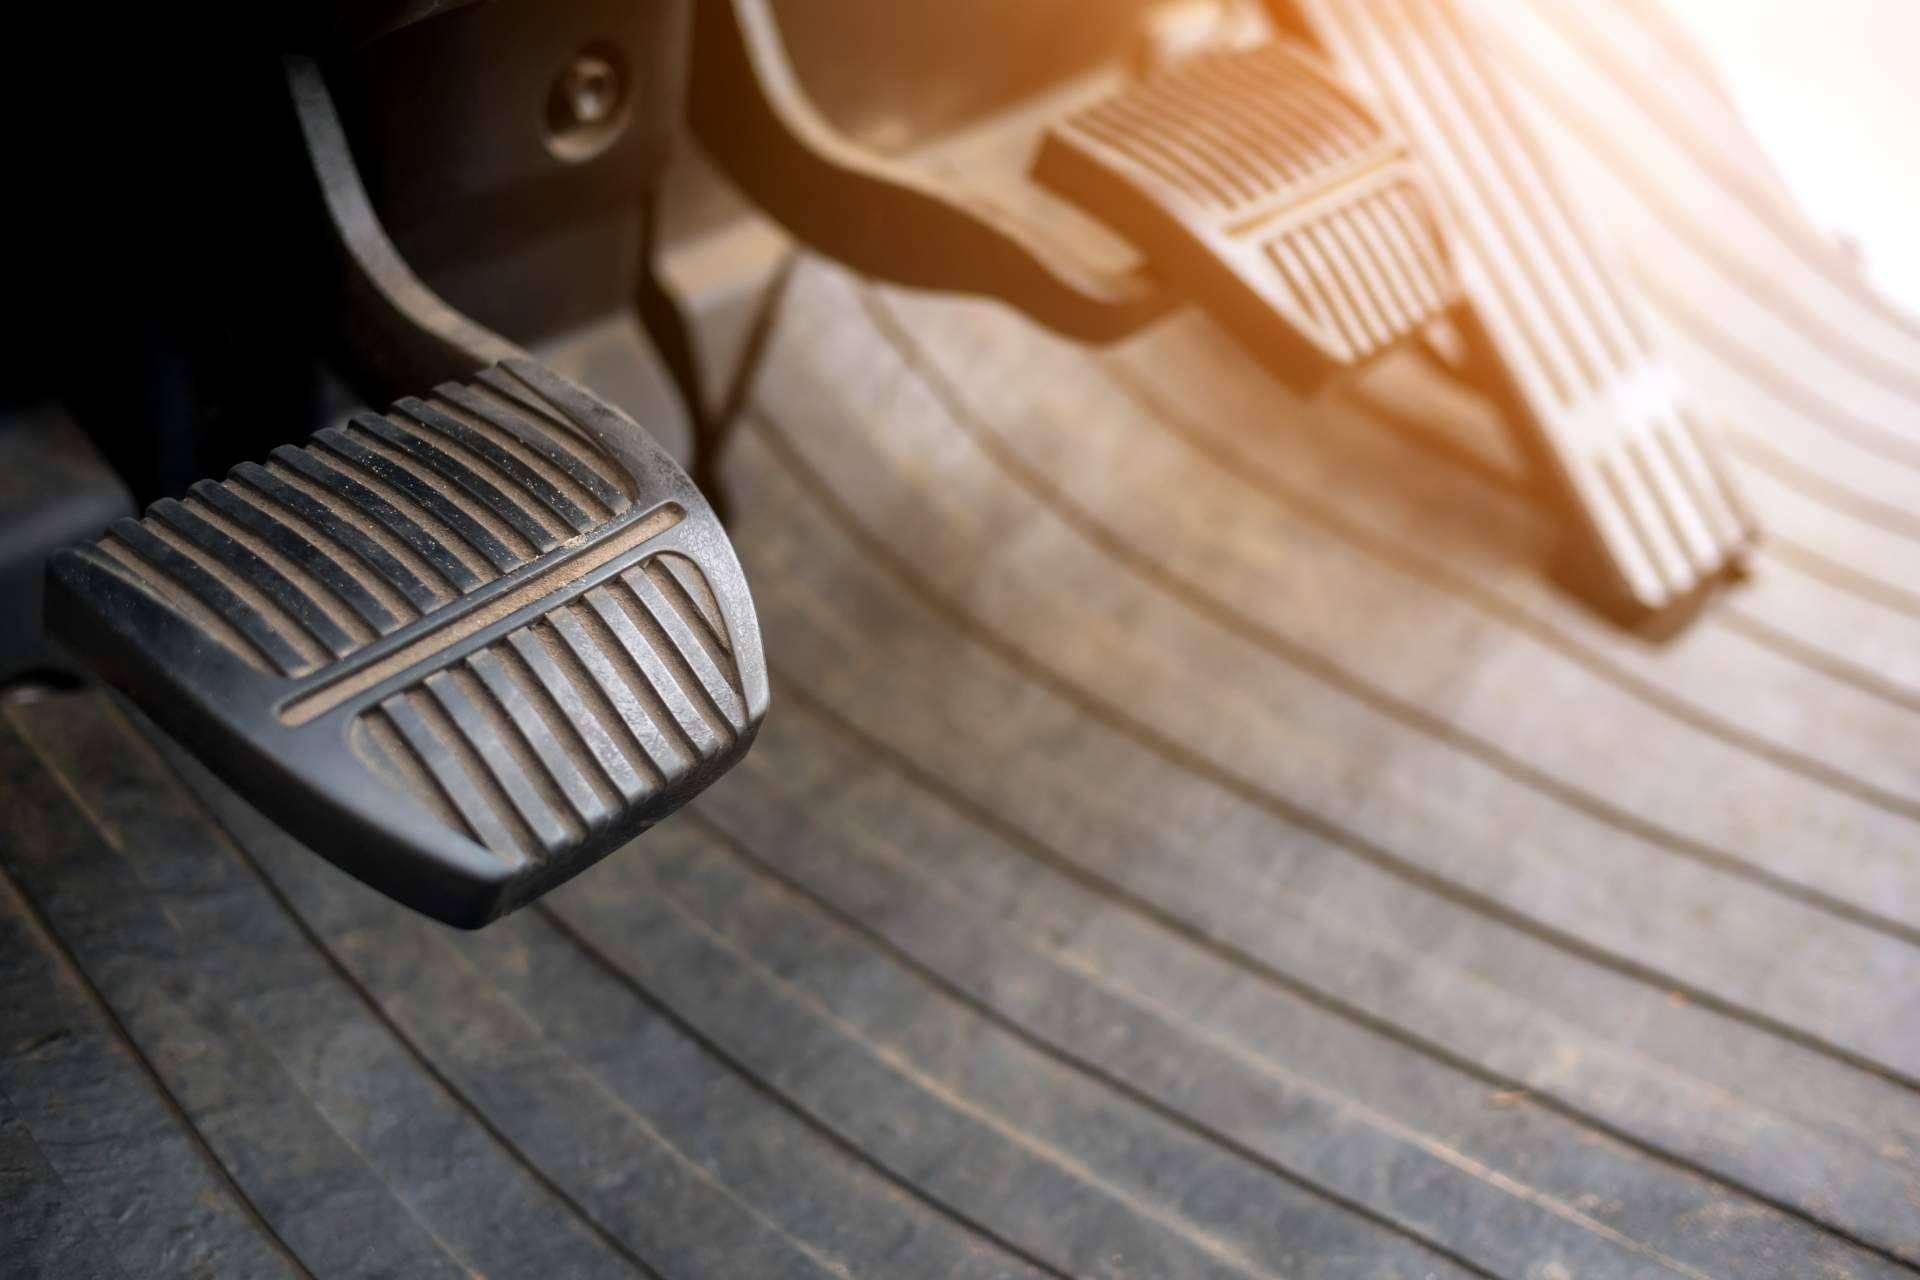 Encontrar embragues baratos para coches en Badalona en el taller Cambio de Embrague